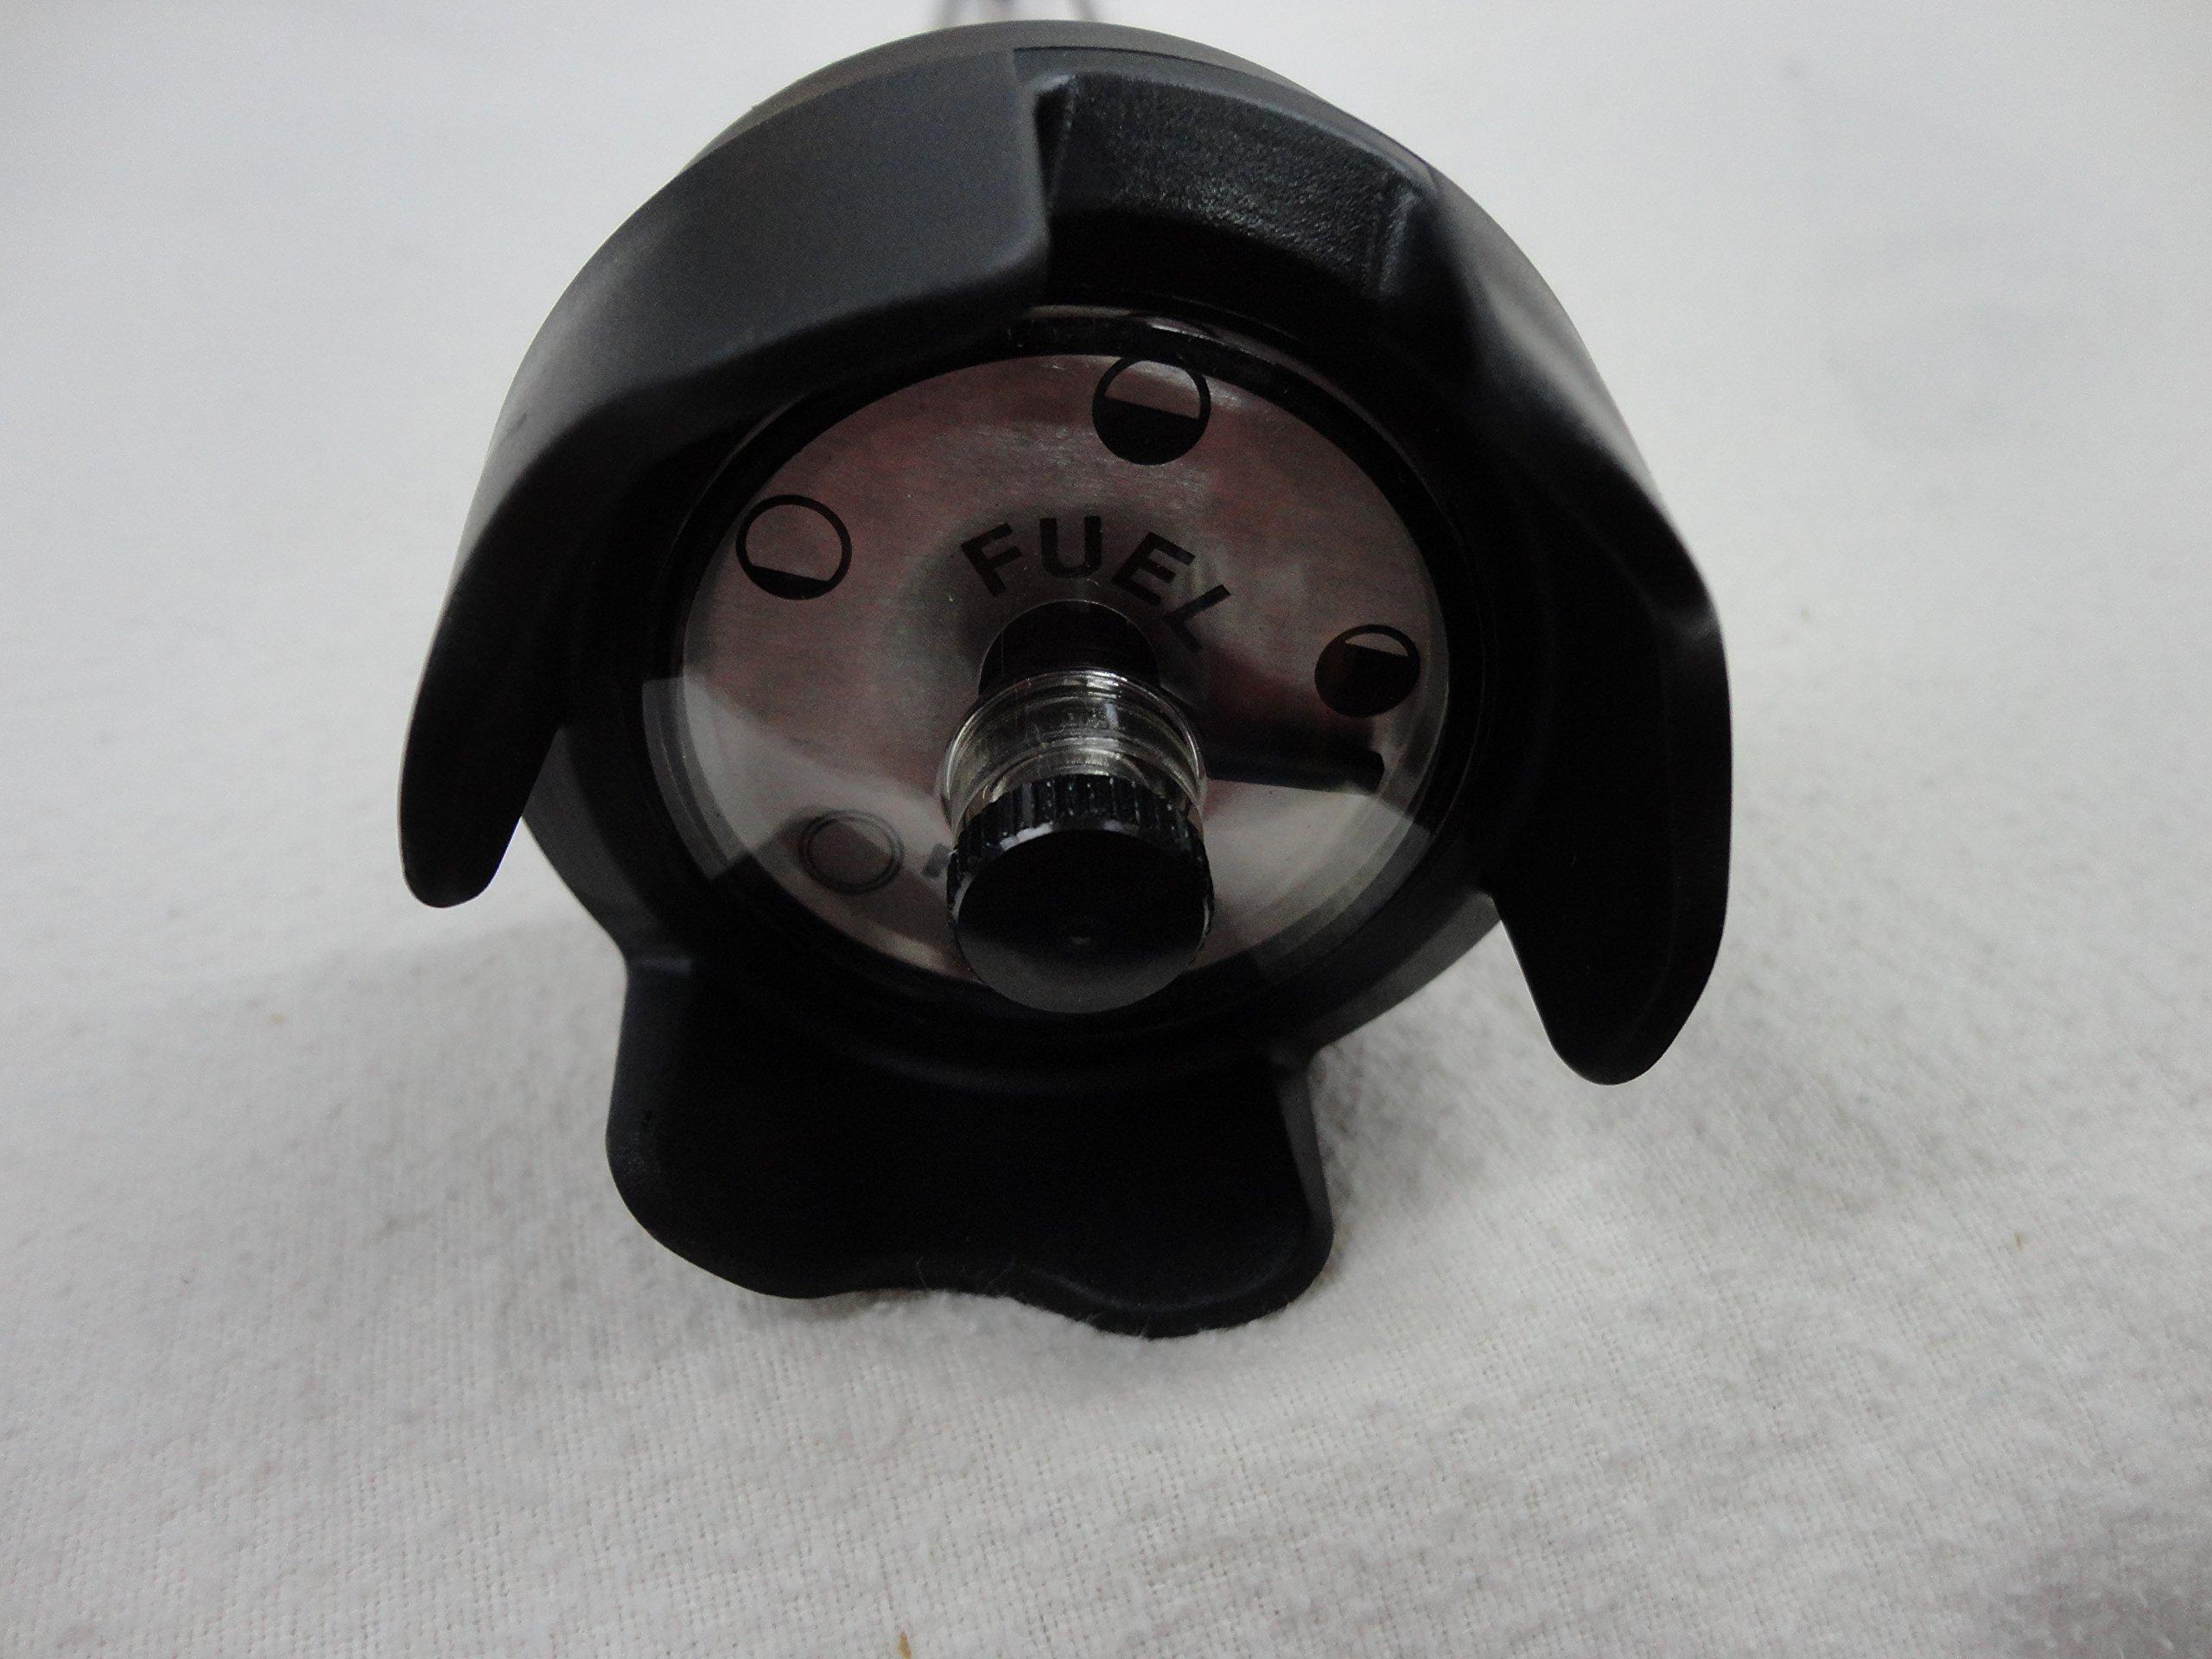 Kelch 7J203622 12'' Threaded Marine Gas Cap with Adjustable Screw Vent